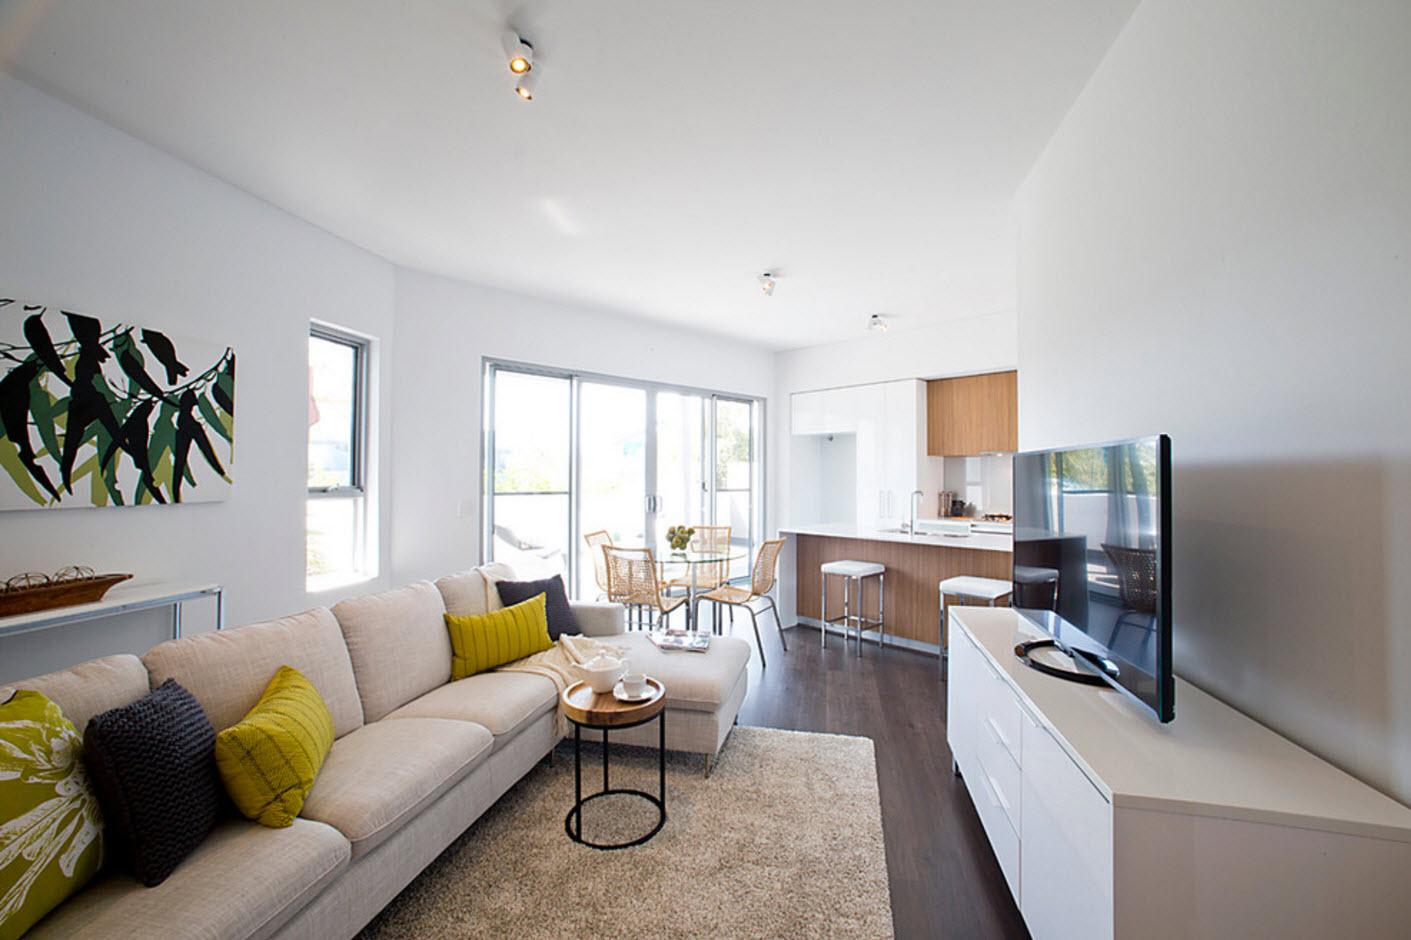 Дизайн больших квартир 2018 фото новинки